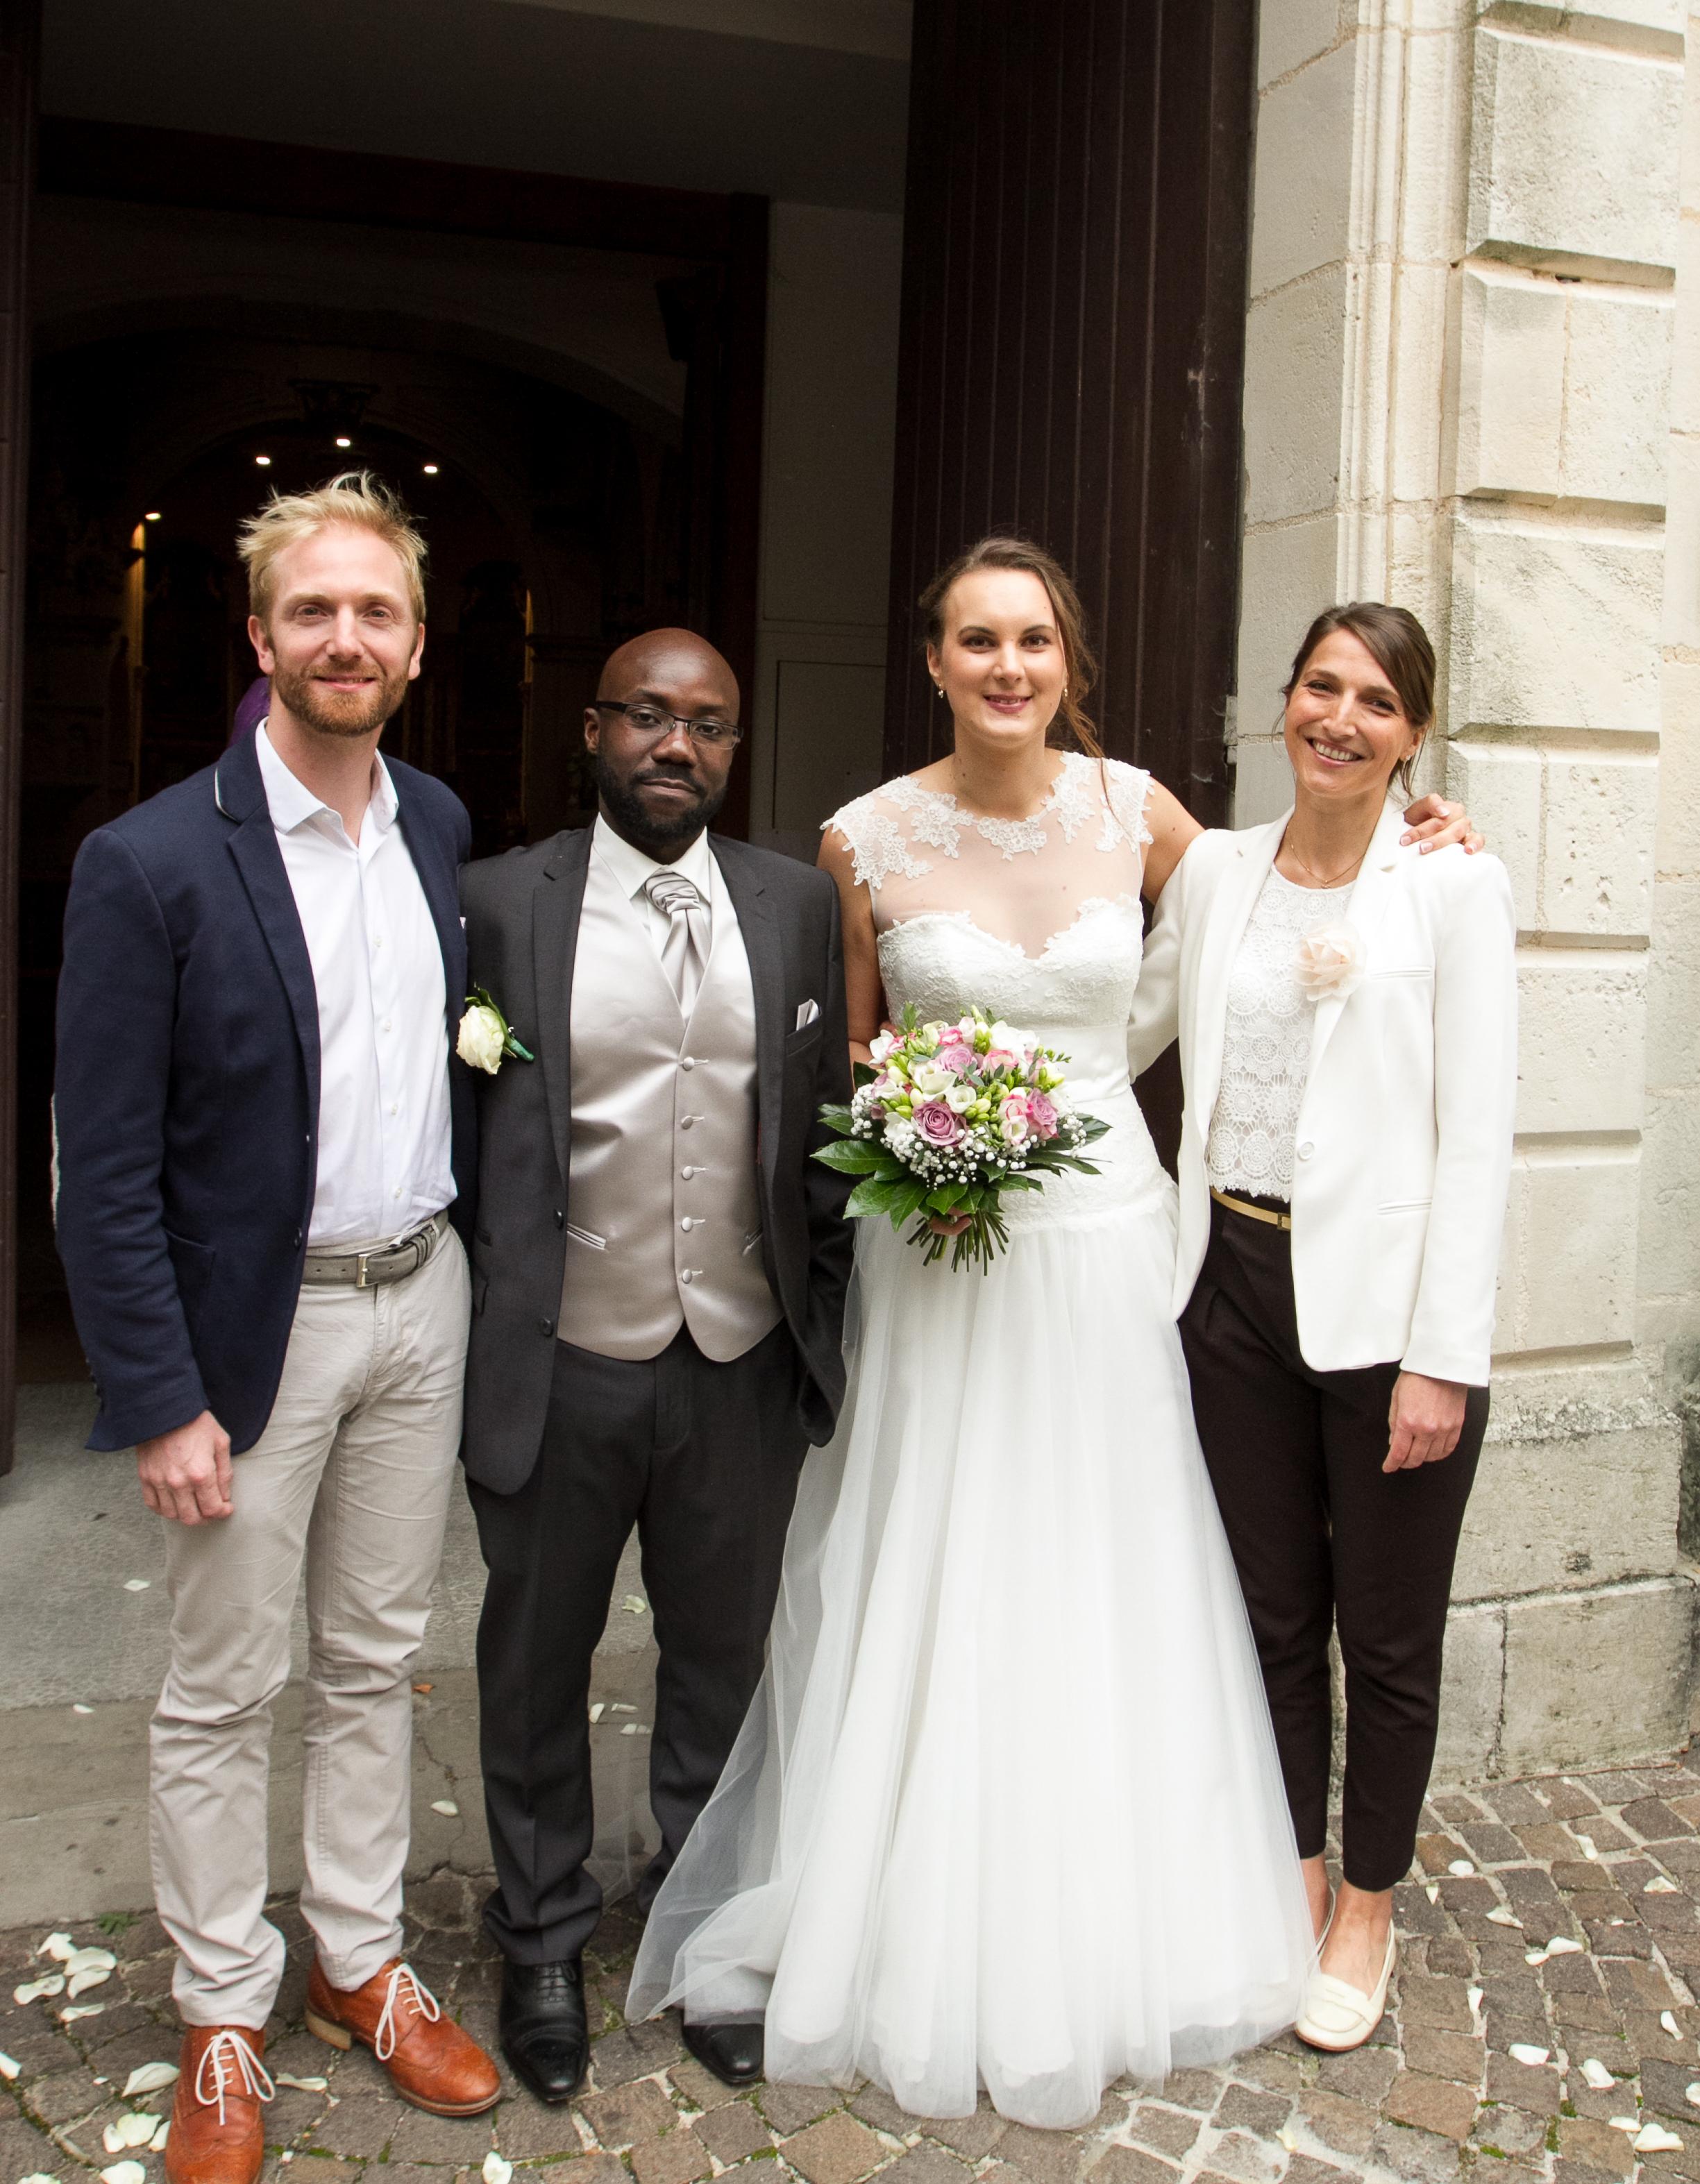 Parvis- mariage religieux Marie & David eglise la teste by Modaliza photographe